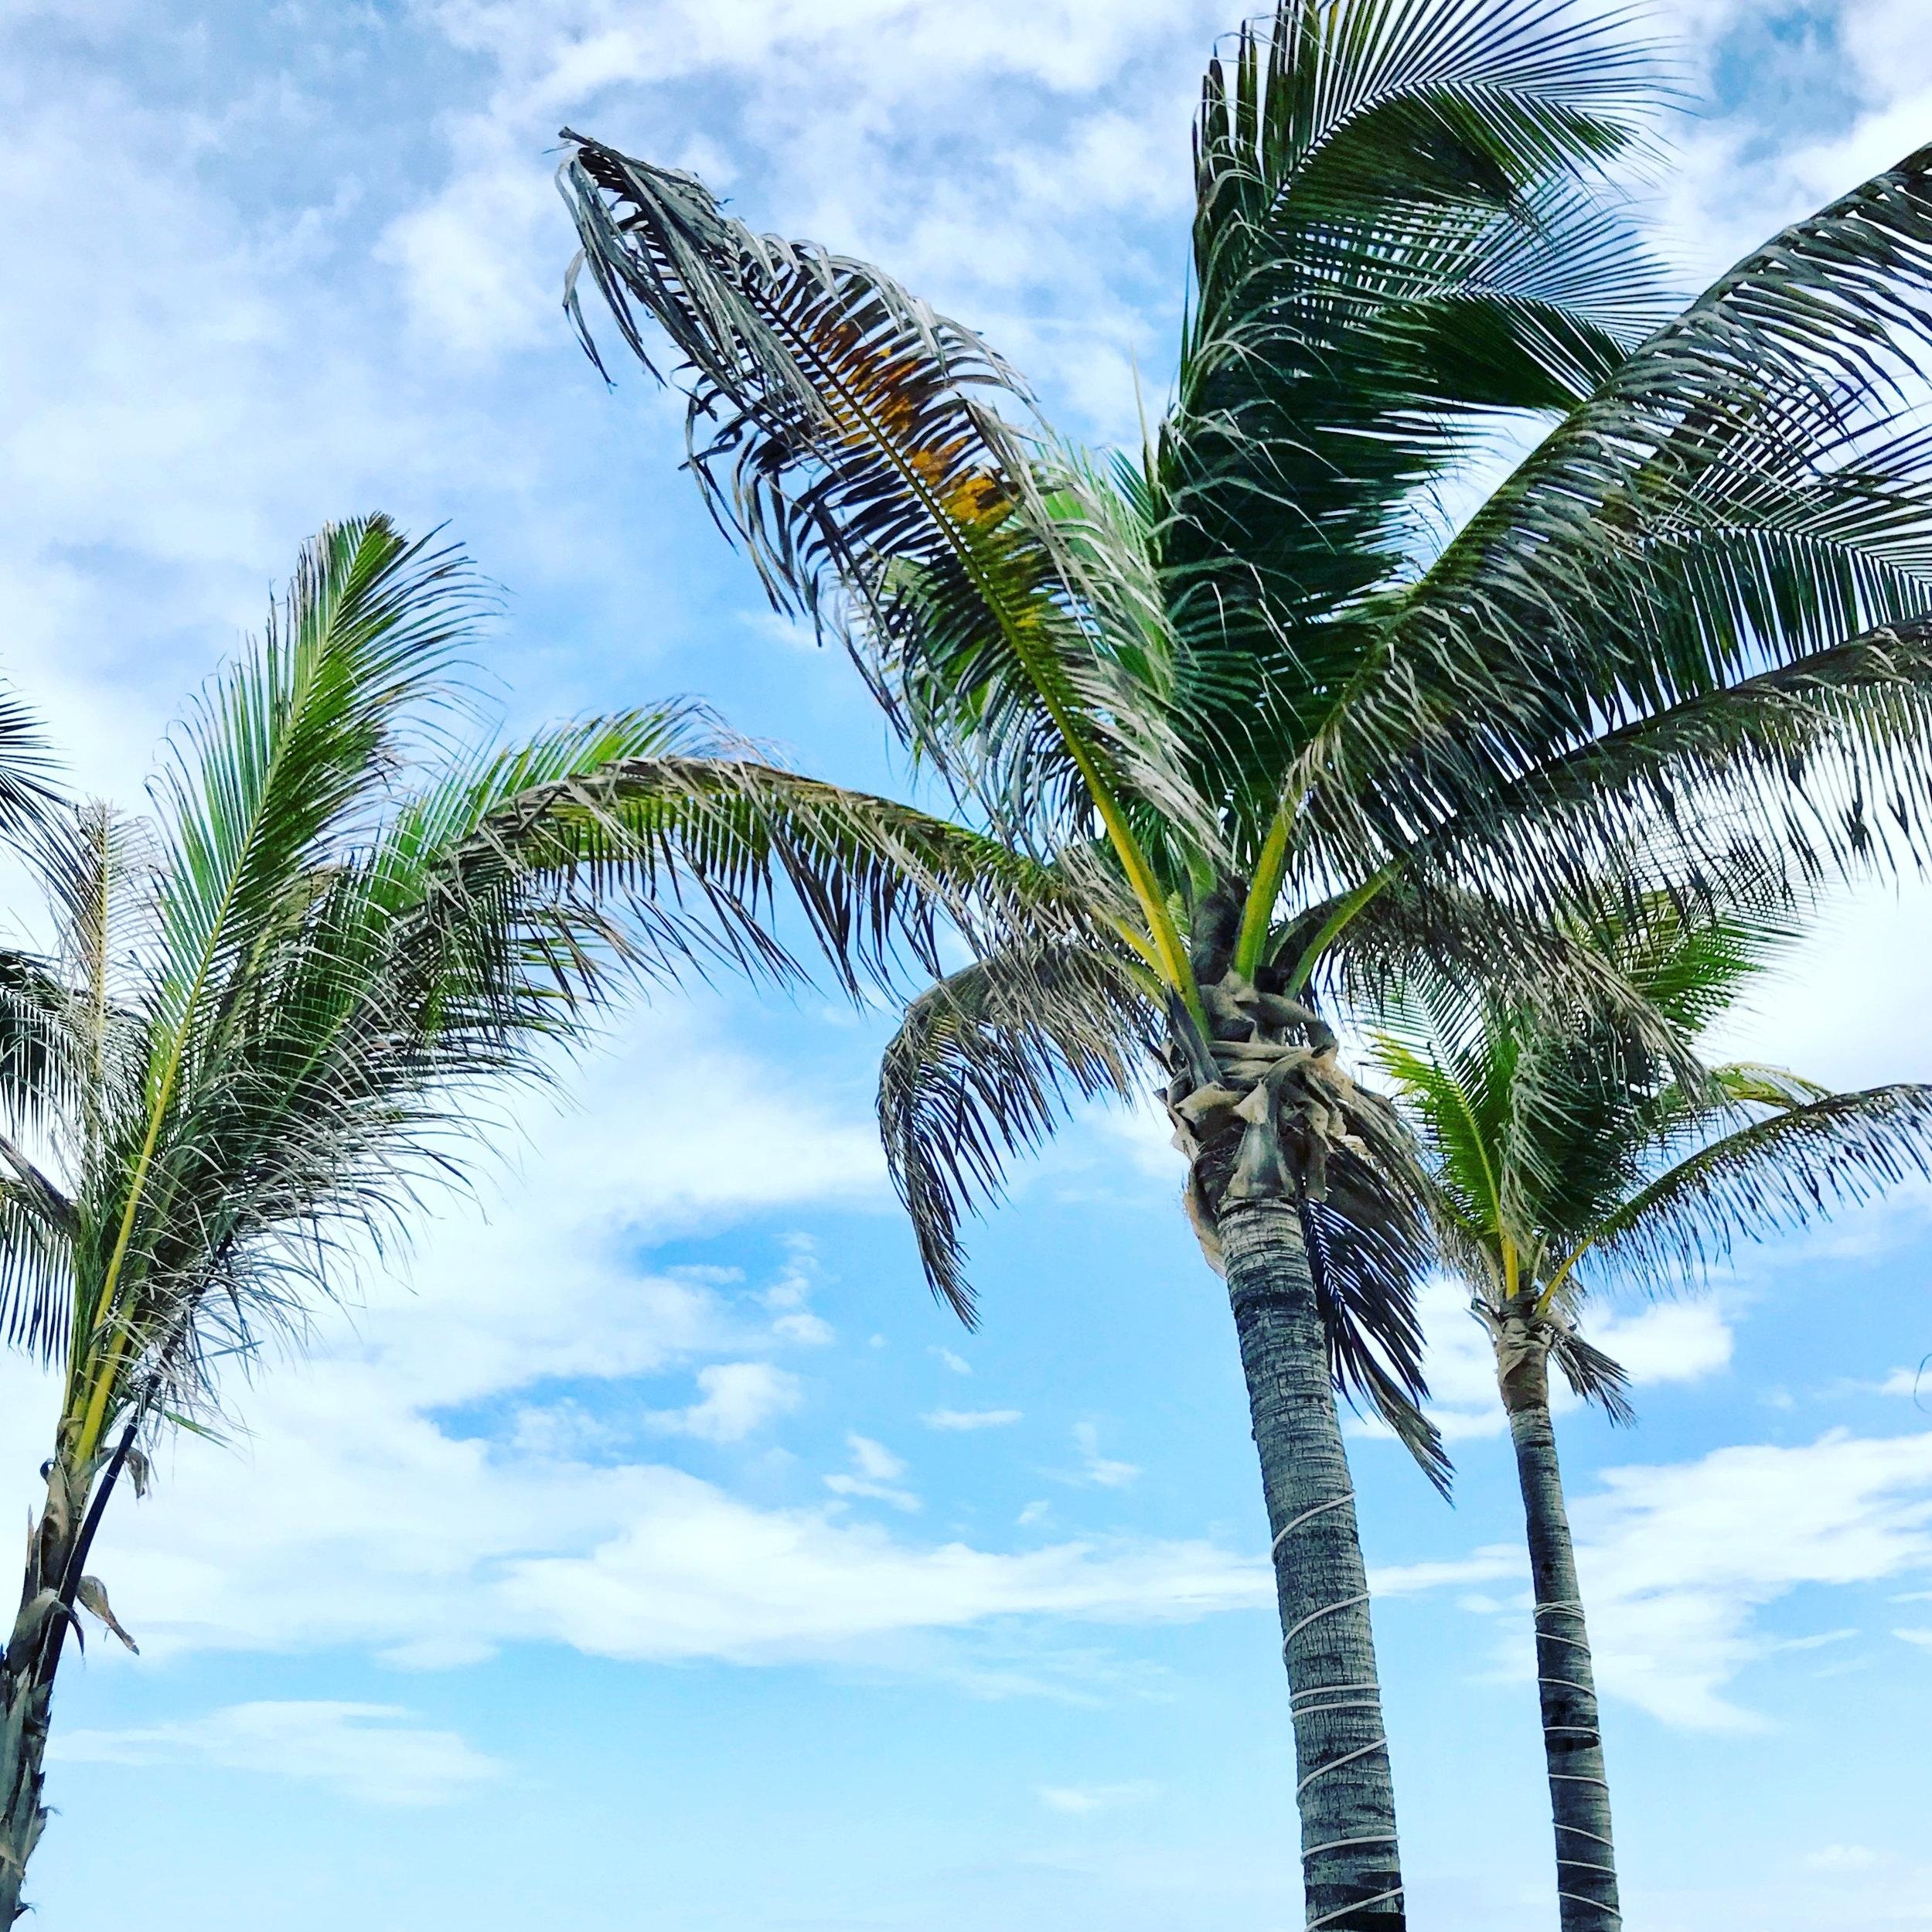 playa del carmen -